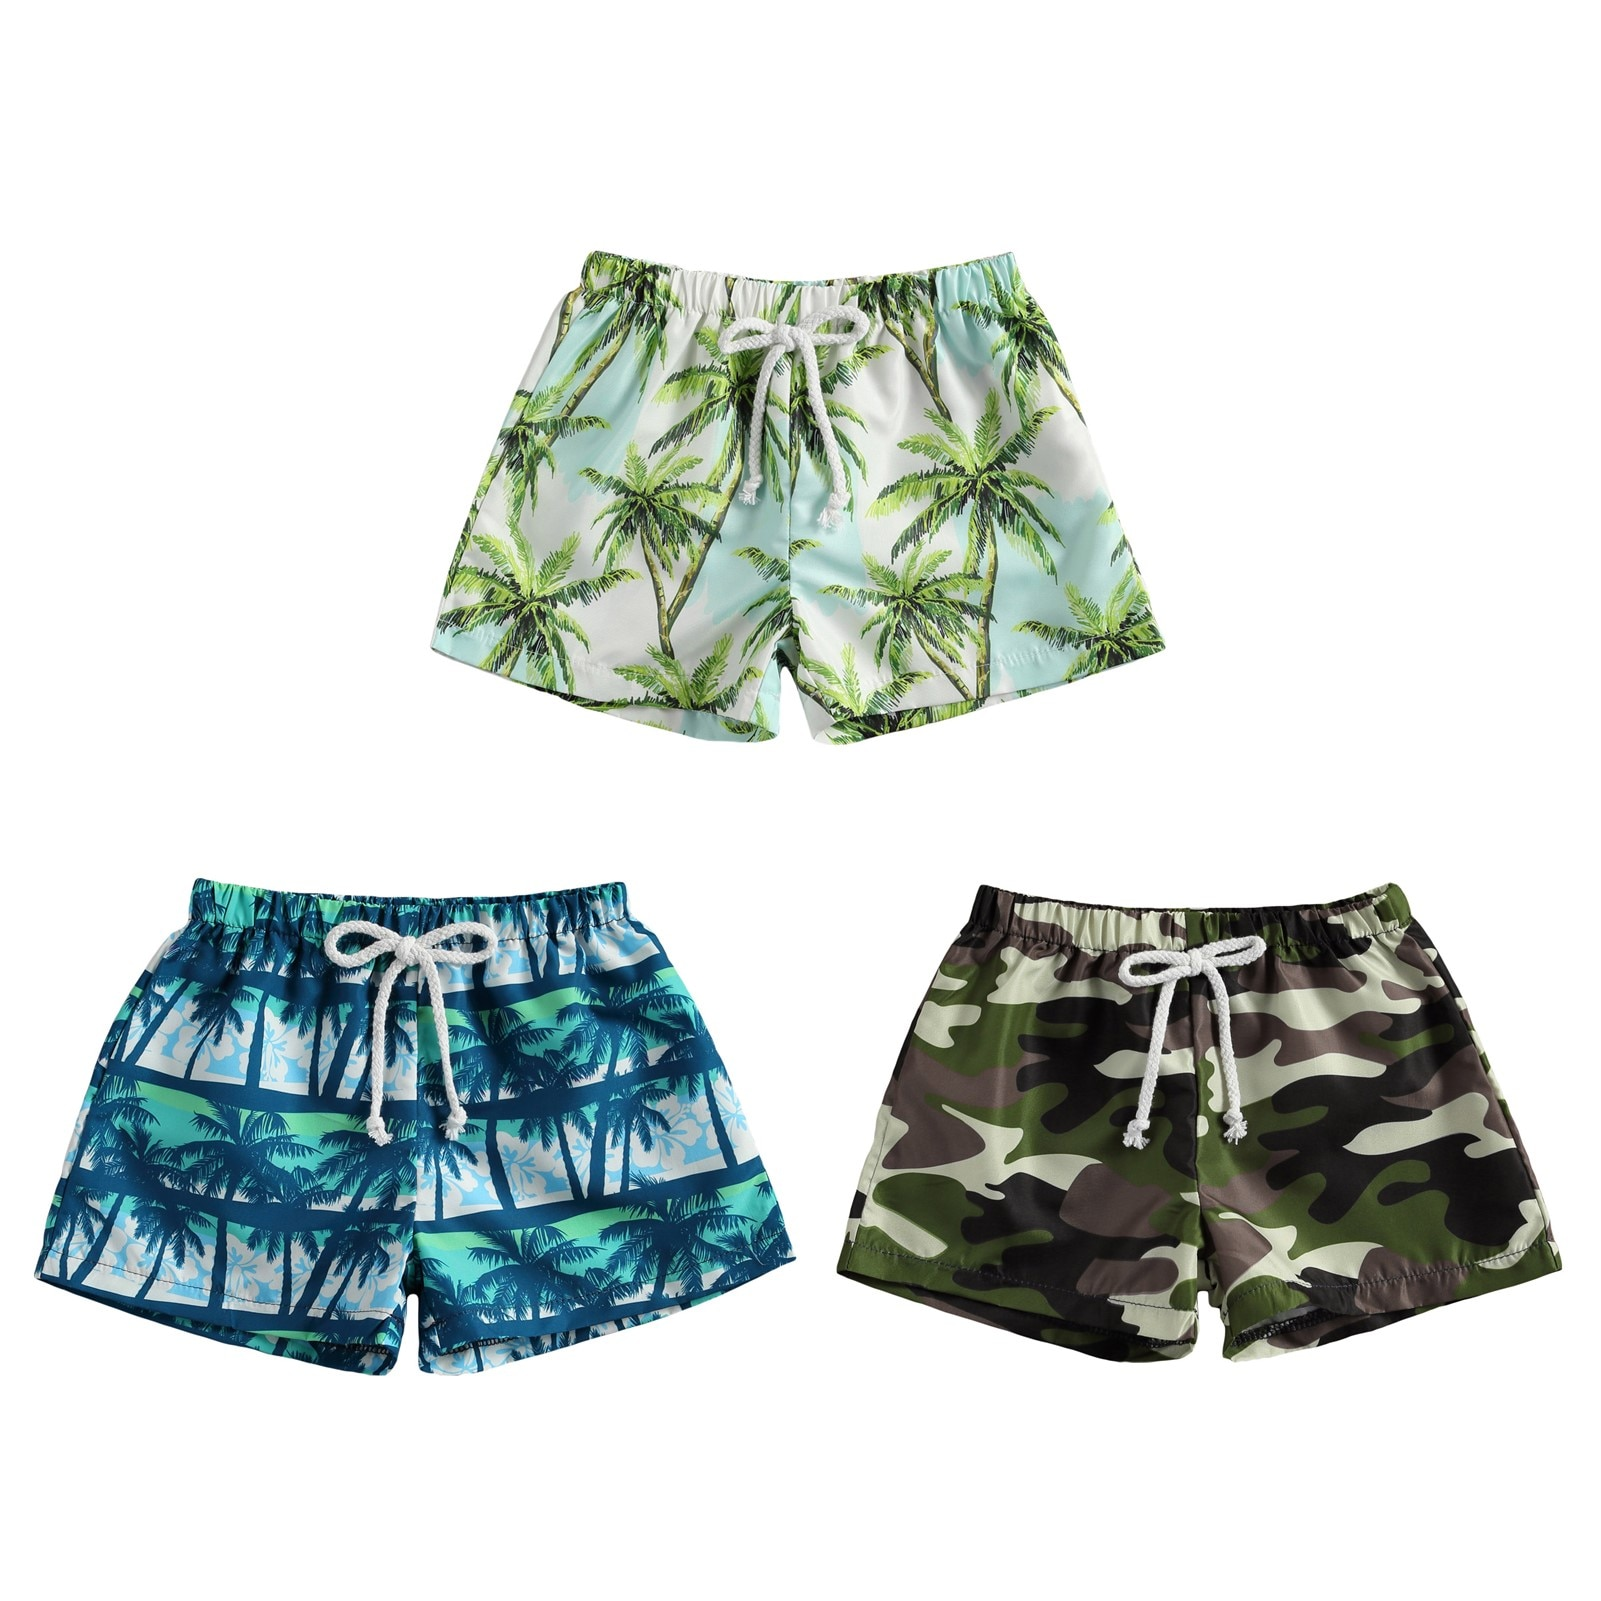 2020 New 1-5Y Toddler Kid Baby Boy Swimwear Camouflage/Palm Tree Print Board Shorts Drawstring Beach